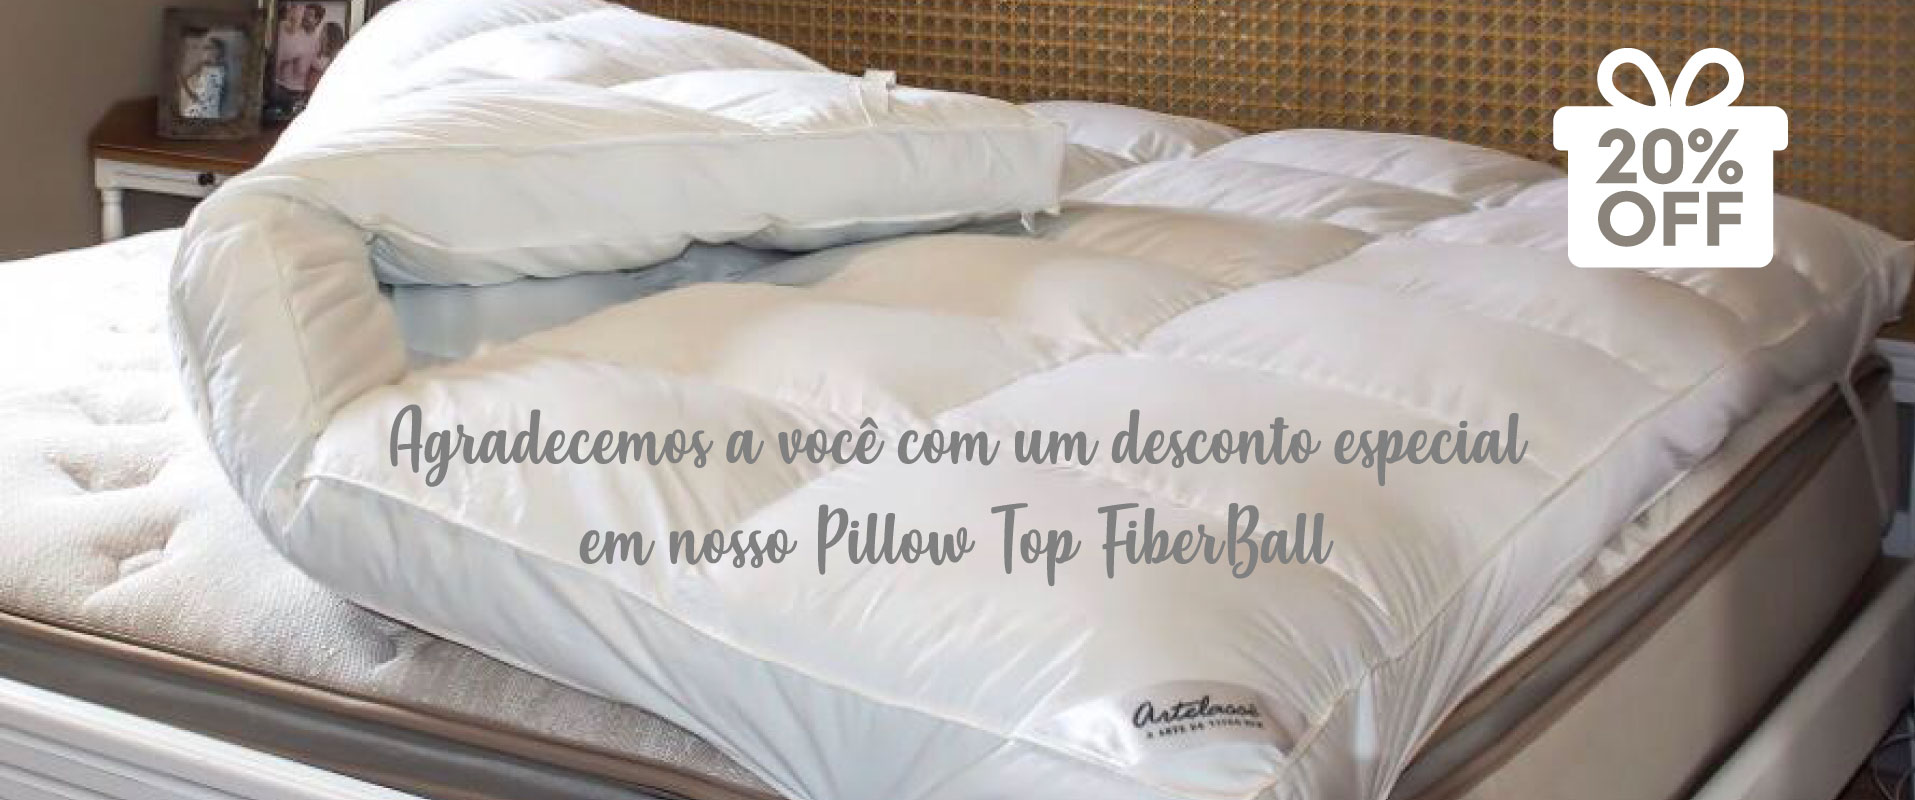 Natal - Pillow 20% OFF